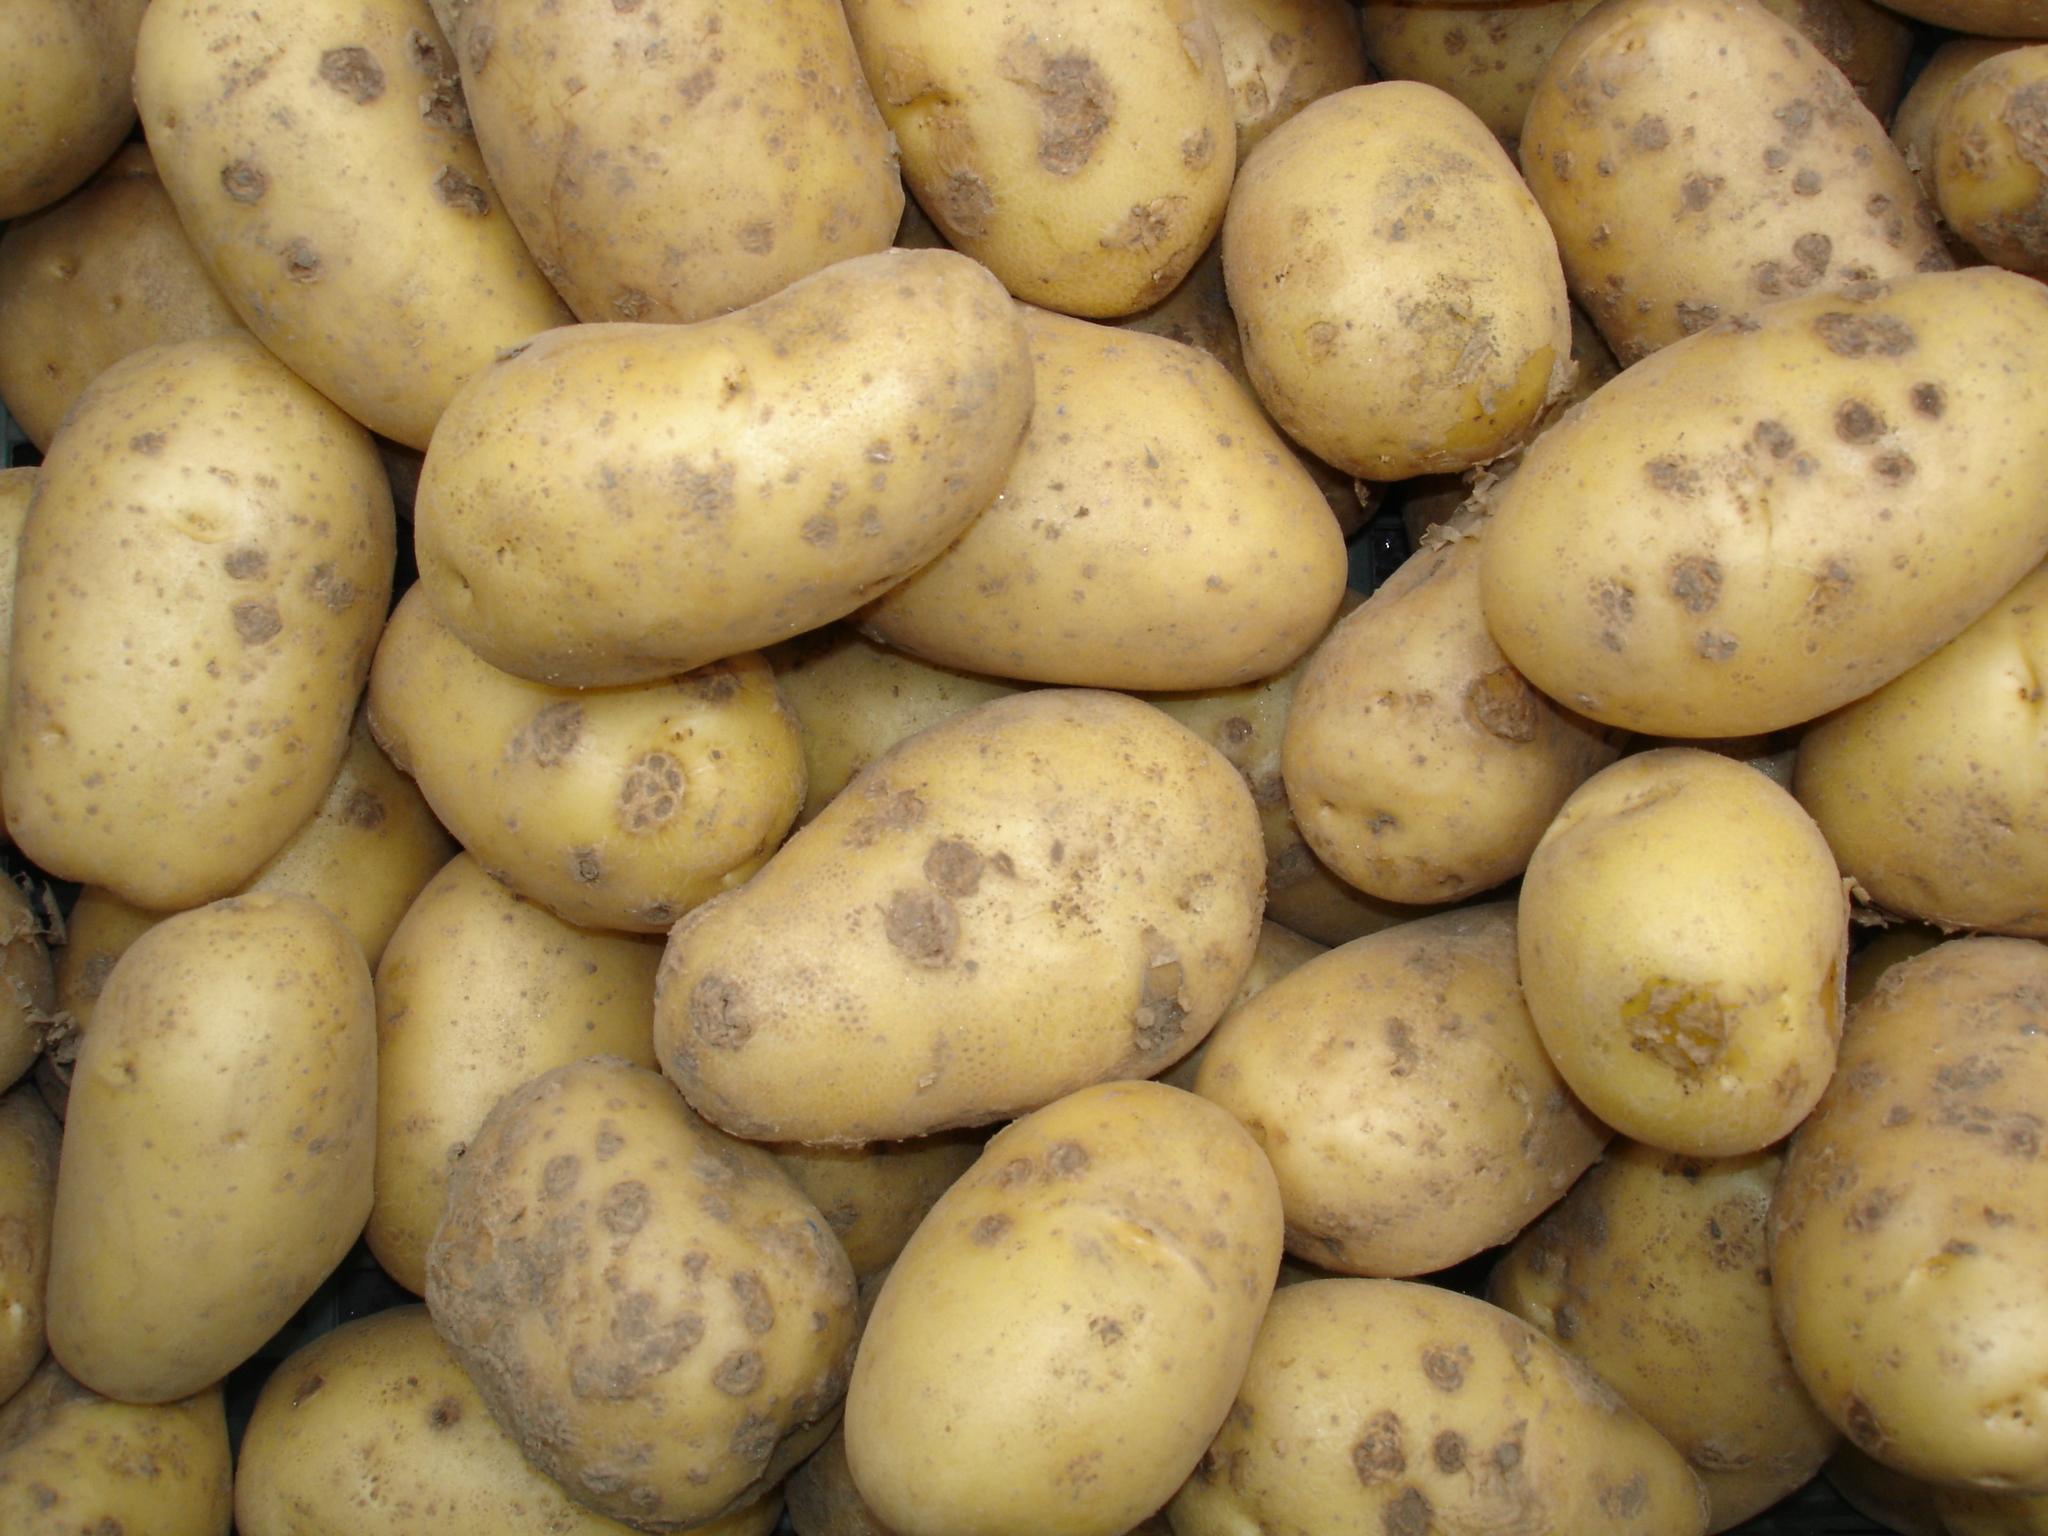 Russet Potatoes arrive in Puerto Vallarta, Mexico